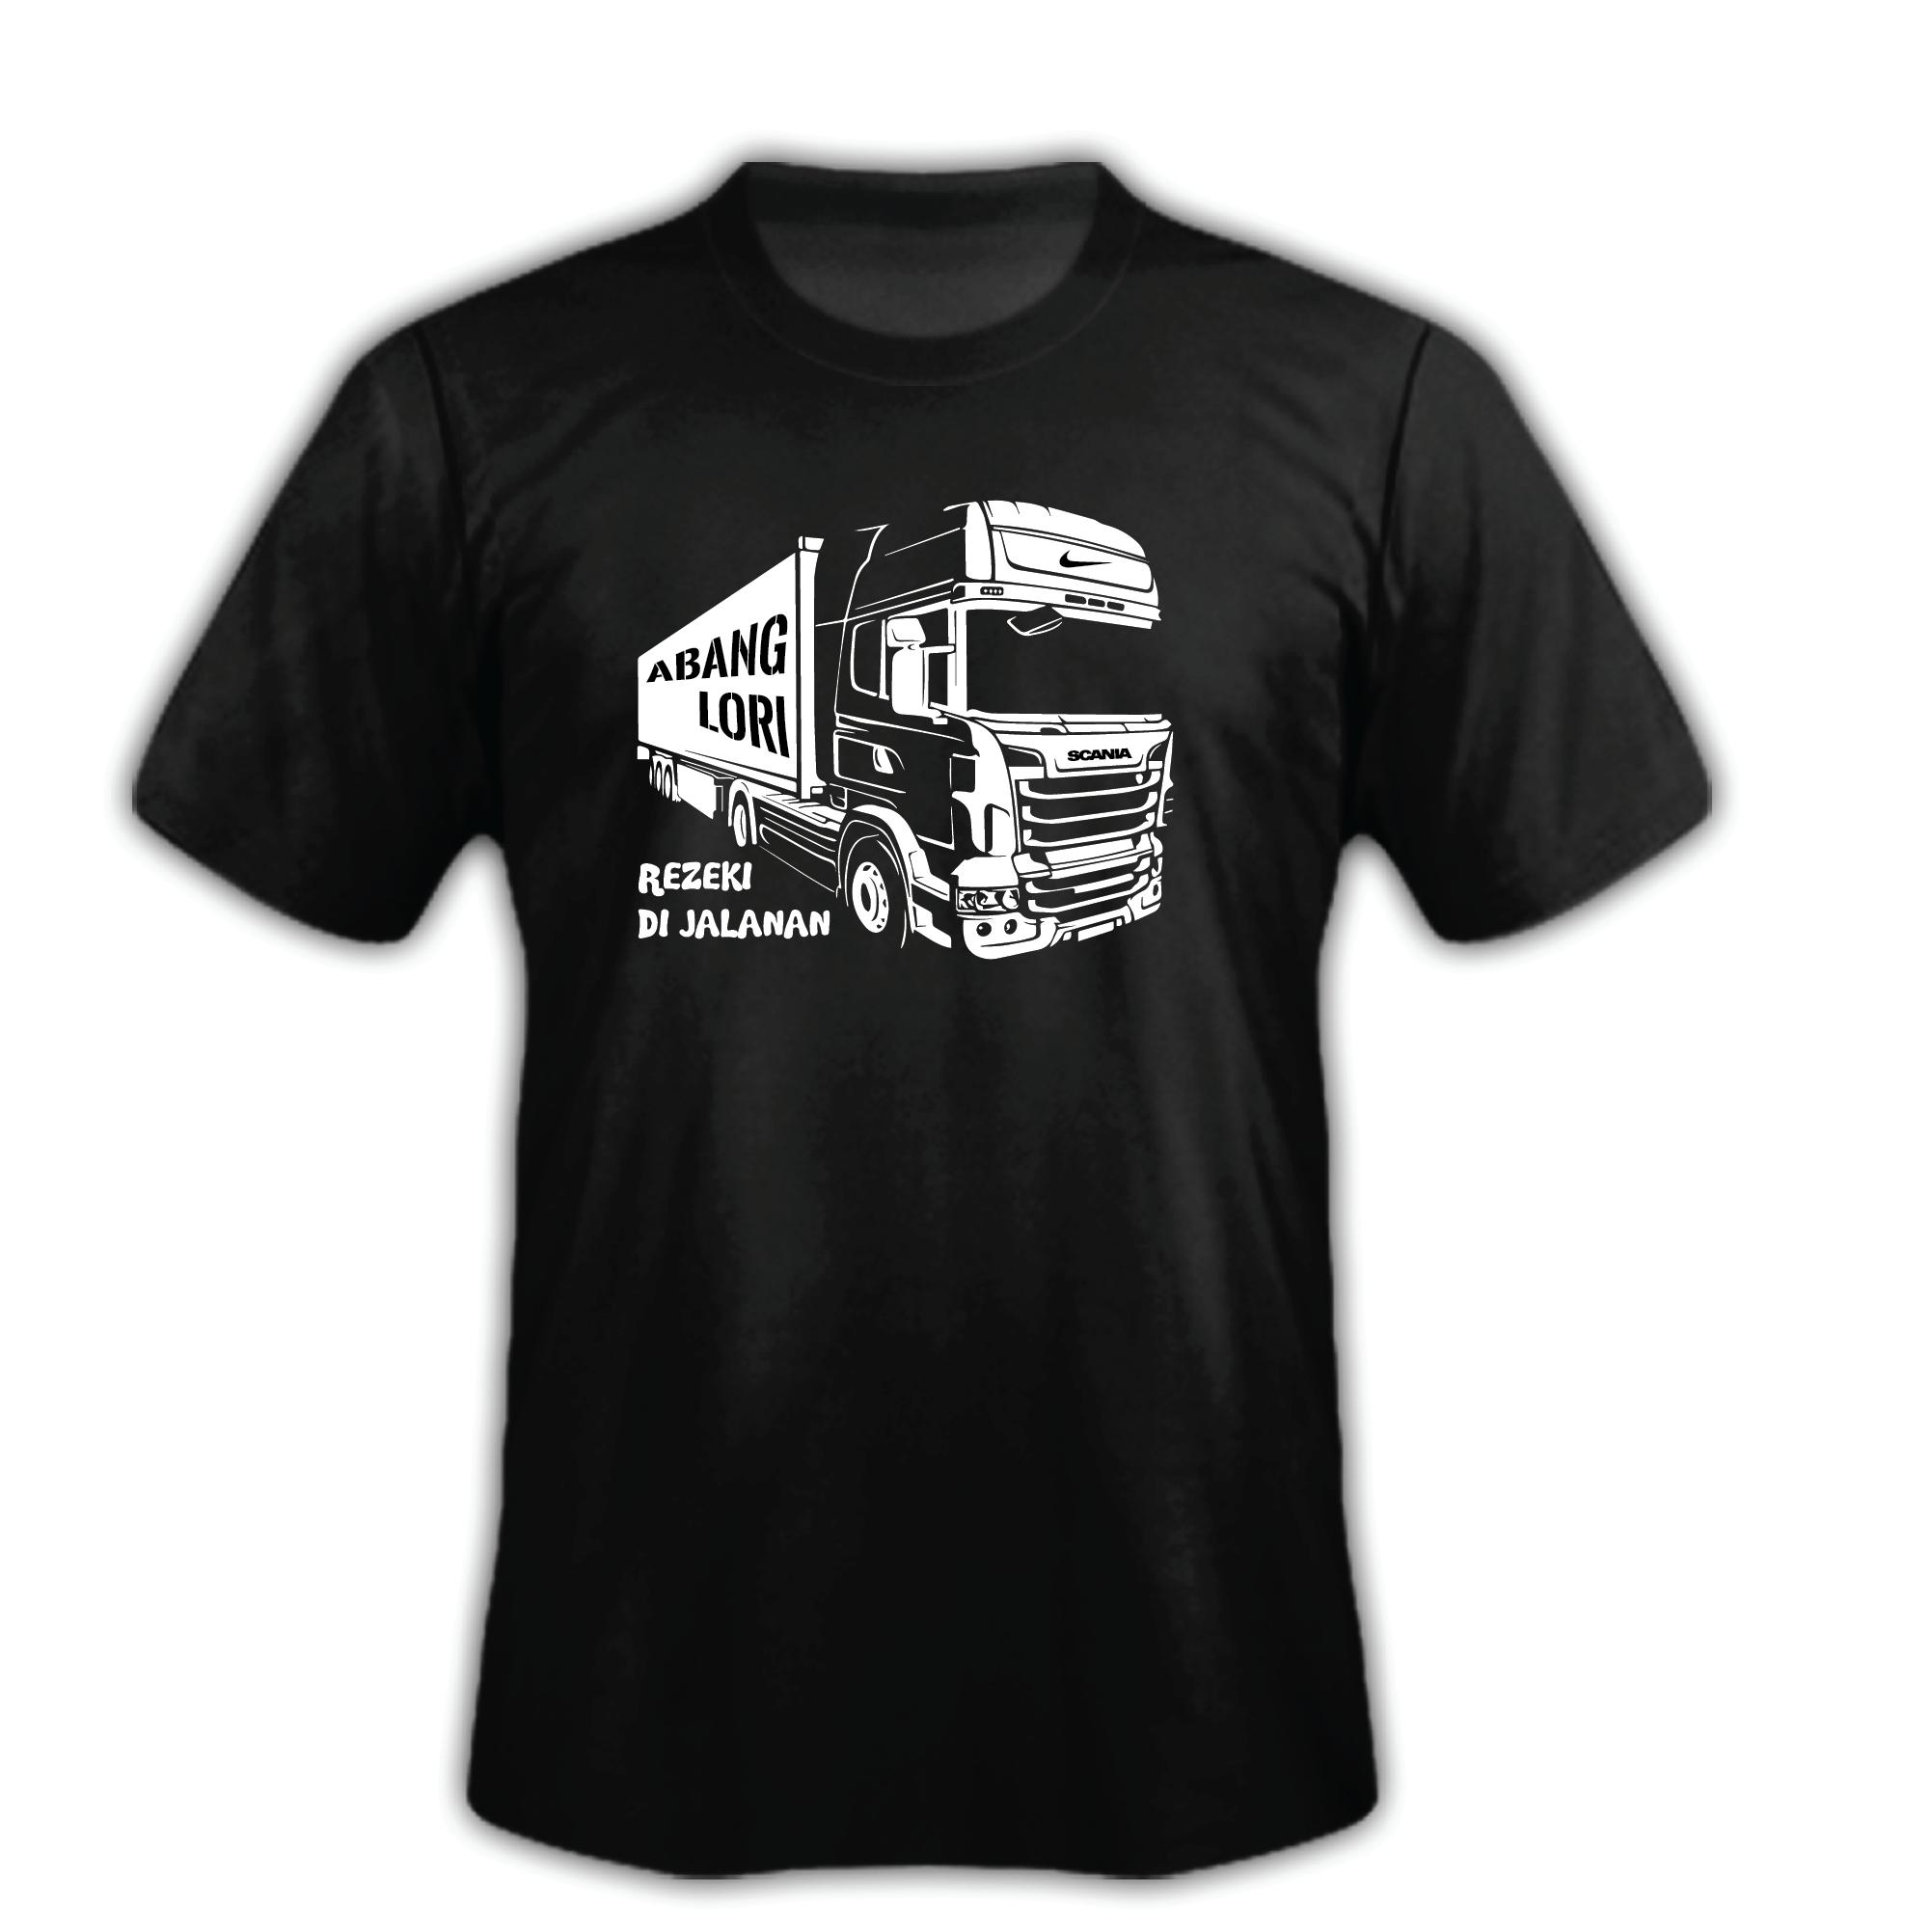 T-Shirt SCANIA ABANG LORI REZEKI DI JALANAN TRUCK 100% Cotton Baju Tshirt Black White Hitam Putih Bossku